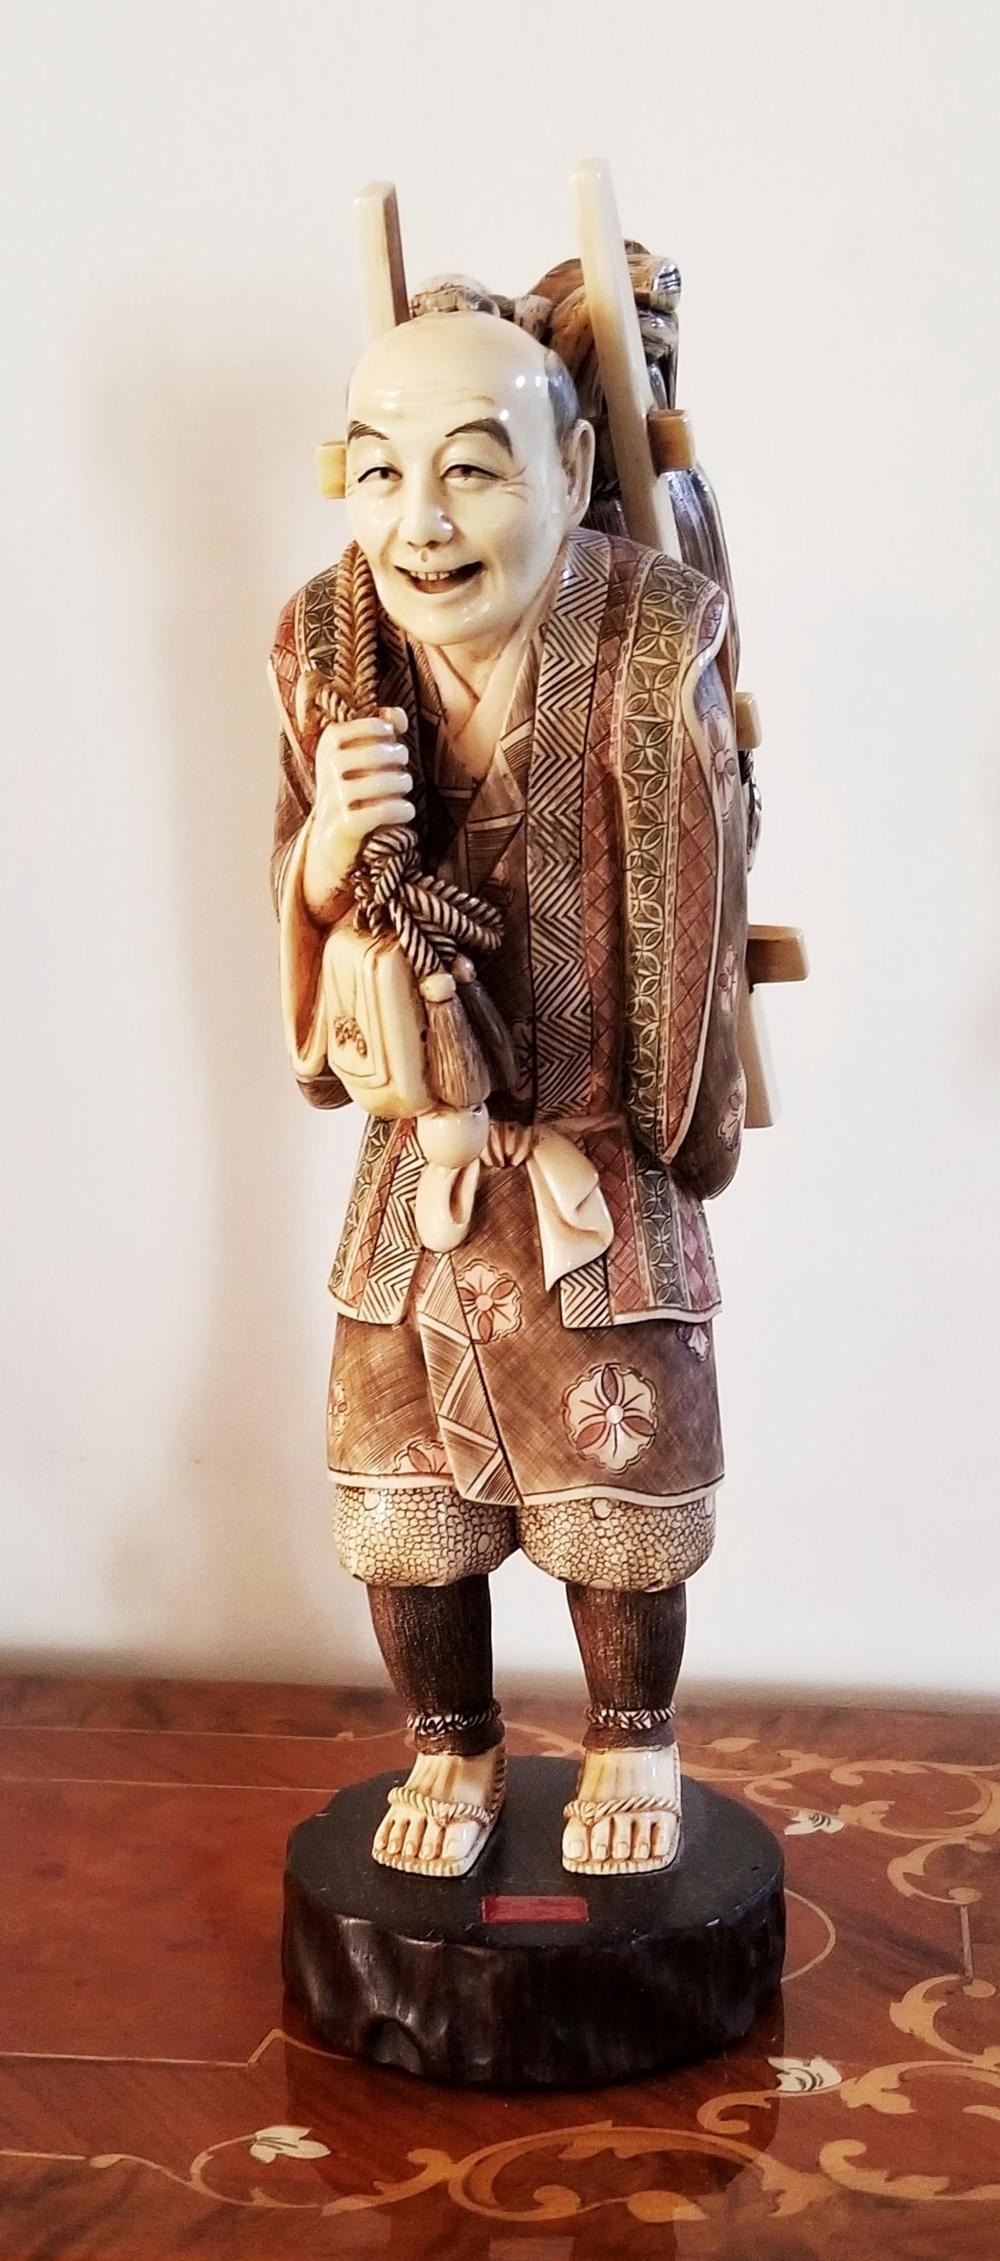 Okimono: Traveler, Carving Tokyo School (1868-1912)